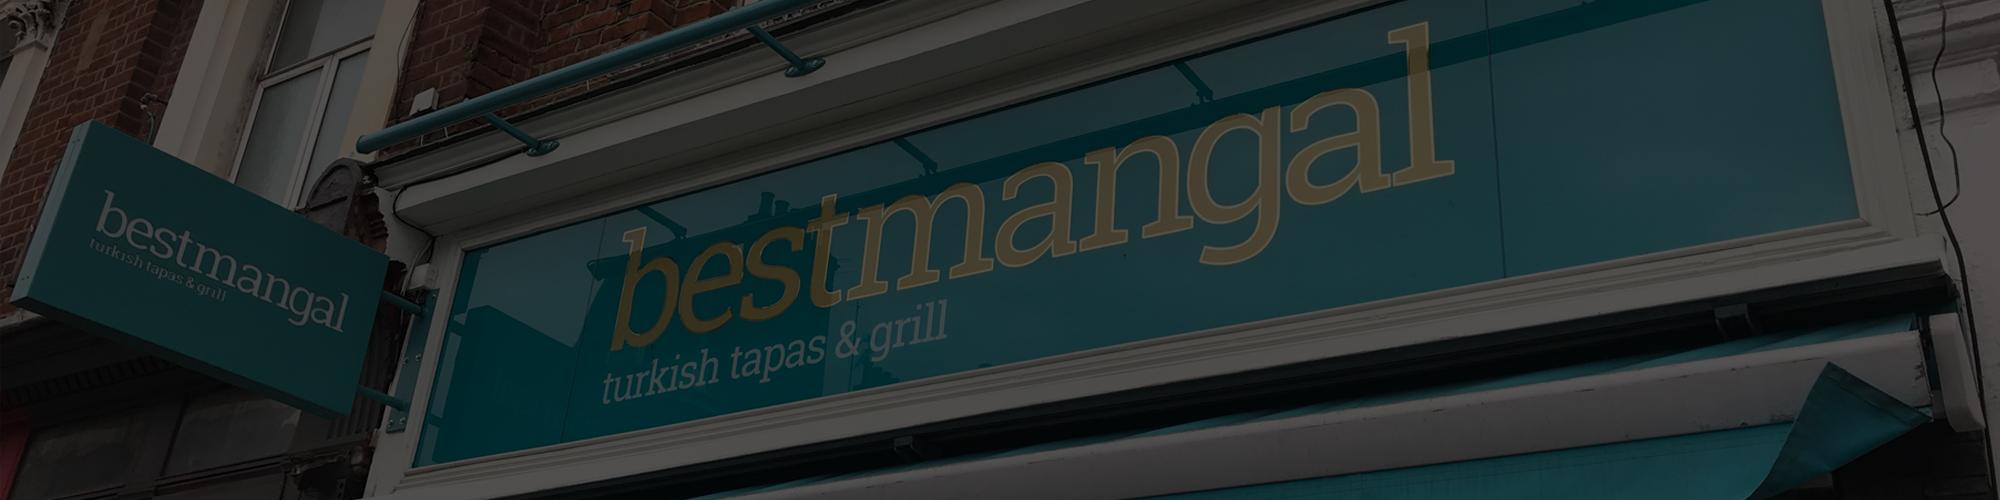 best mangal turkish tapas & grill external shopfront signage